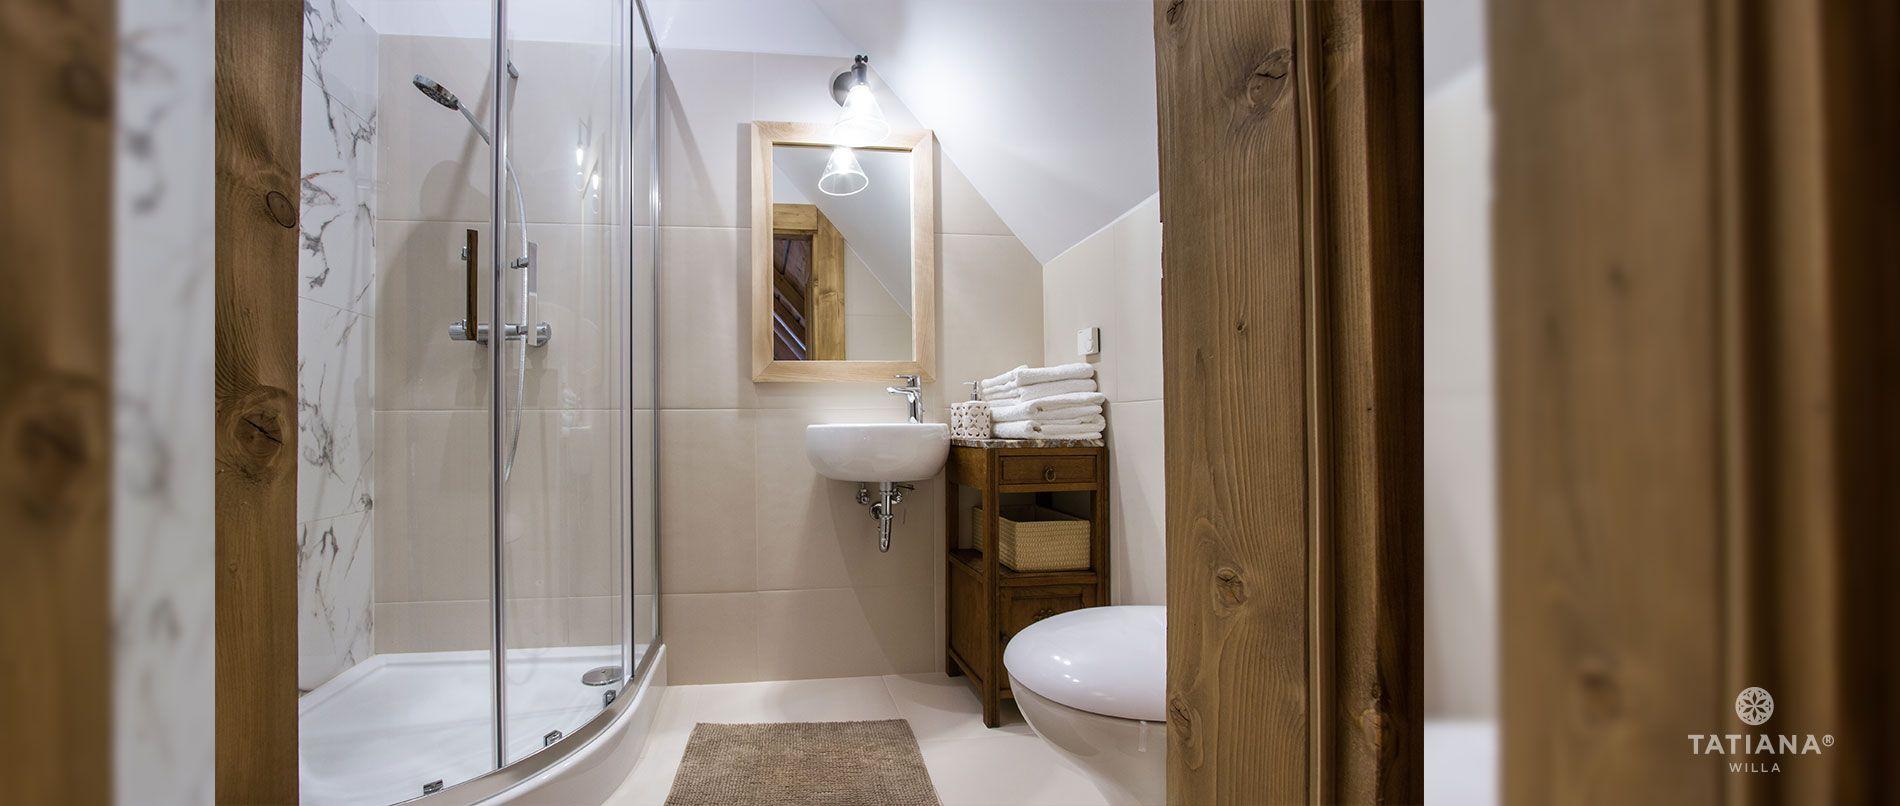 Apartament Stary Smrekowy - druga łazienka